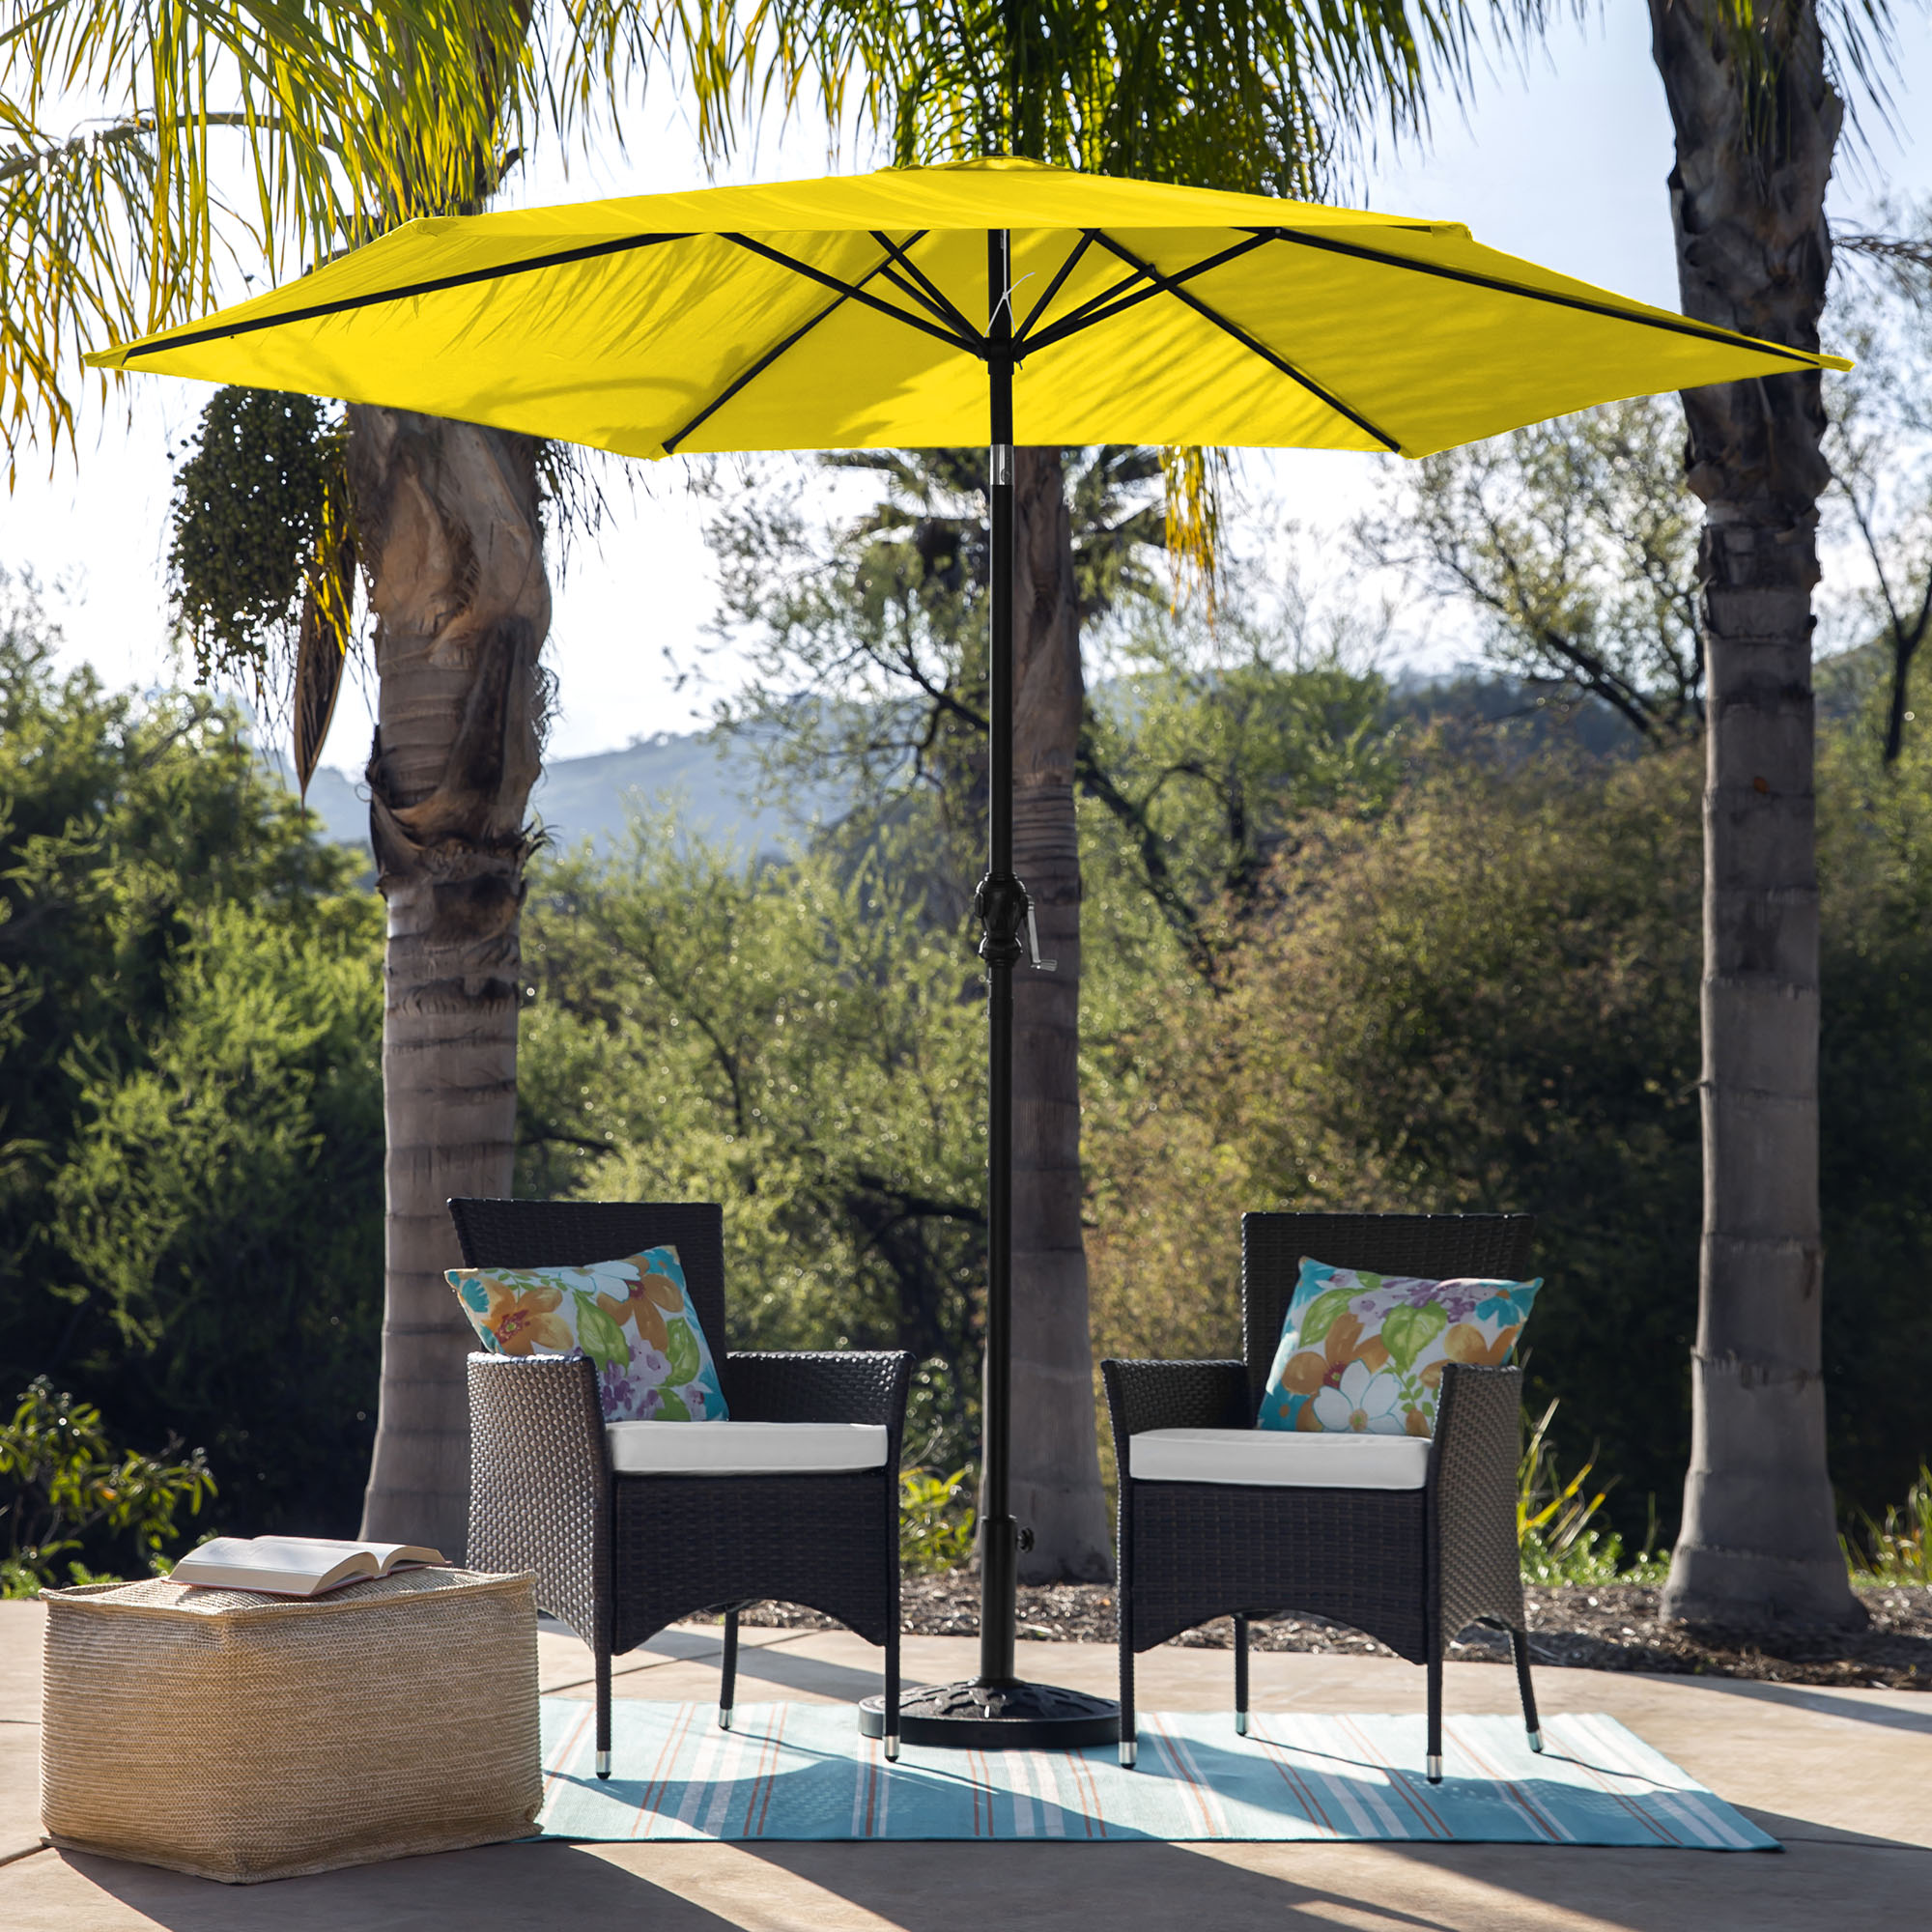 BCP-10ft-Outdoor-Steel-Market-Patio-Umbrella-Decoration-w-Tilt-Crank thumbnail 65